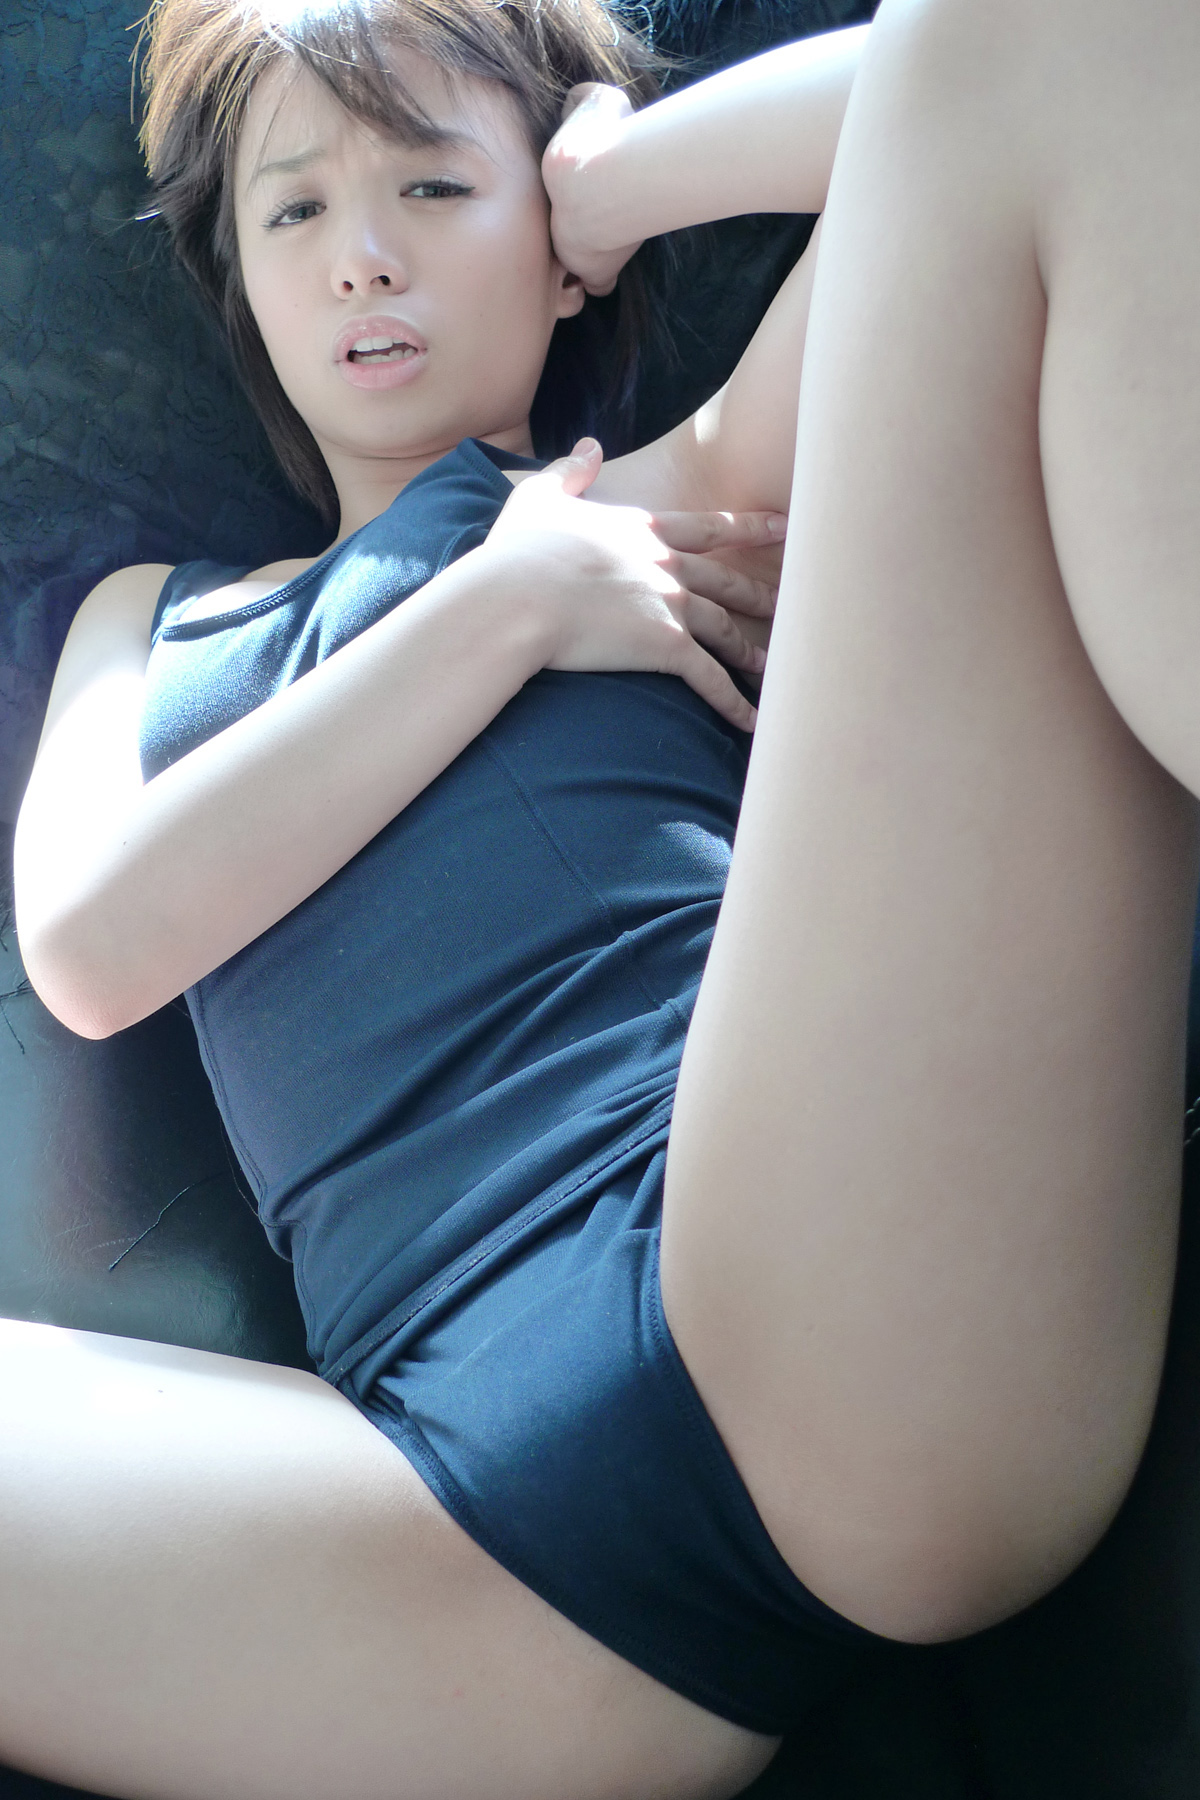 14-jpg [HF/UPL] [週刊] 星美りか Rika Hoshimi Vol.04 [2010.12.15] 08180